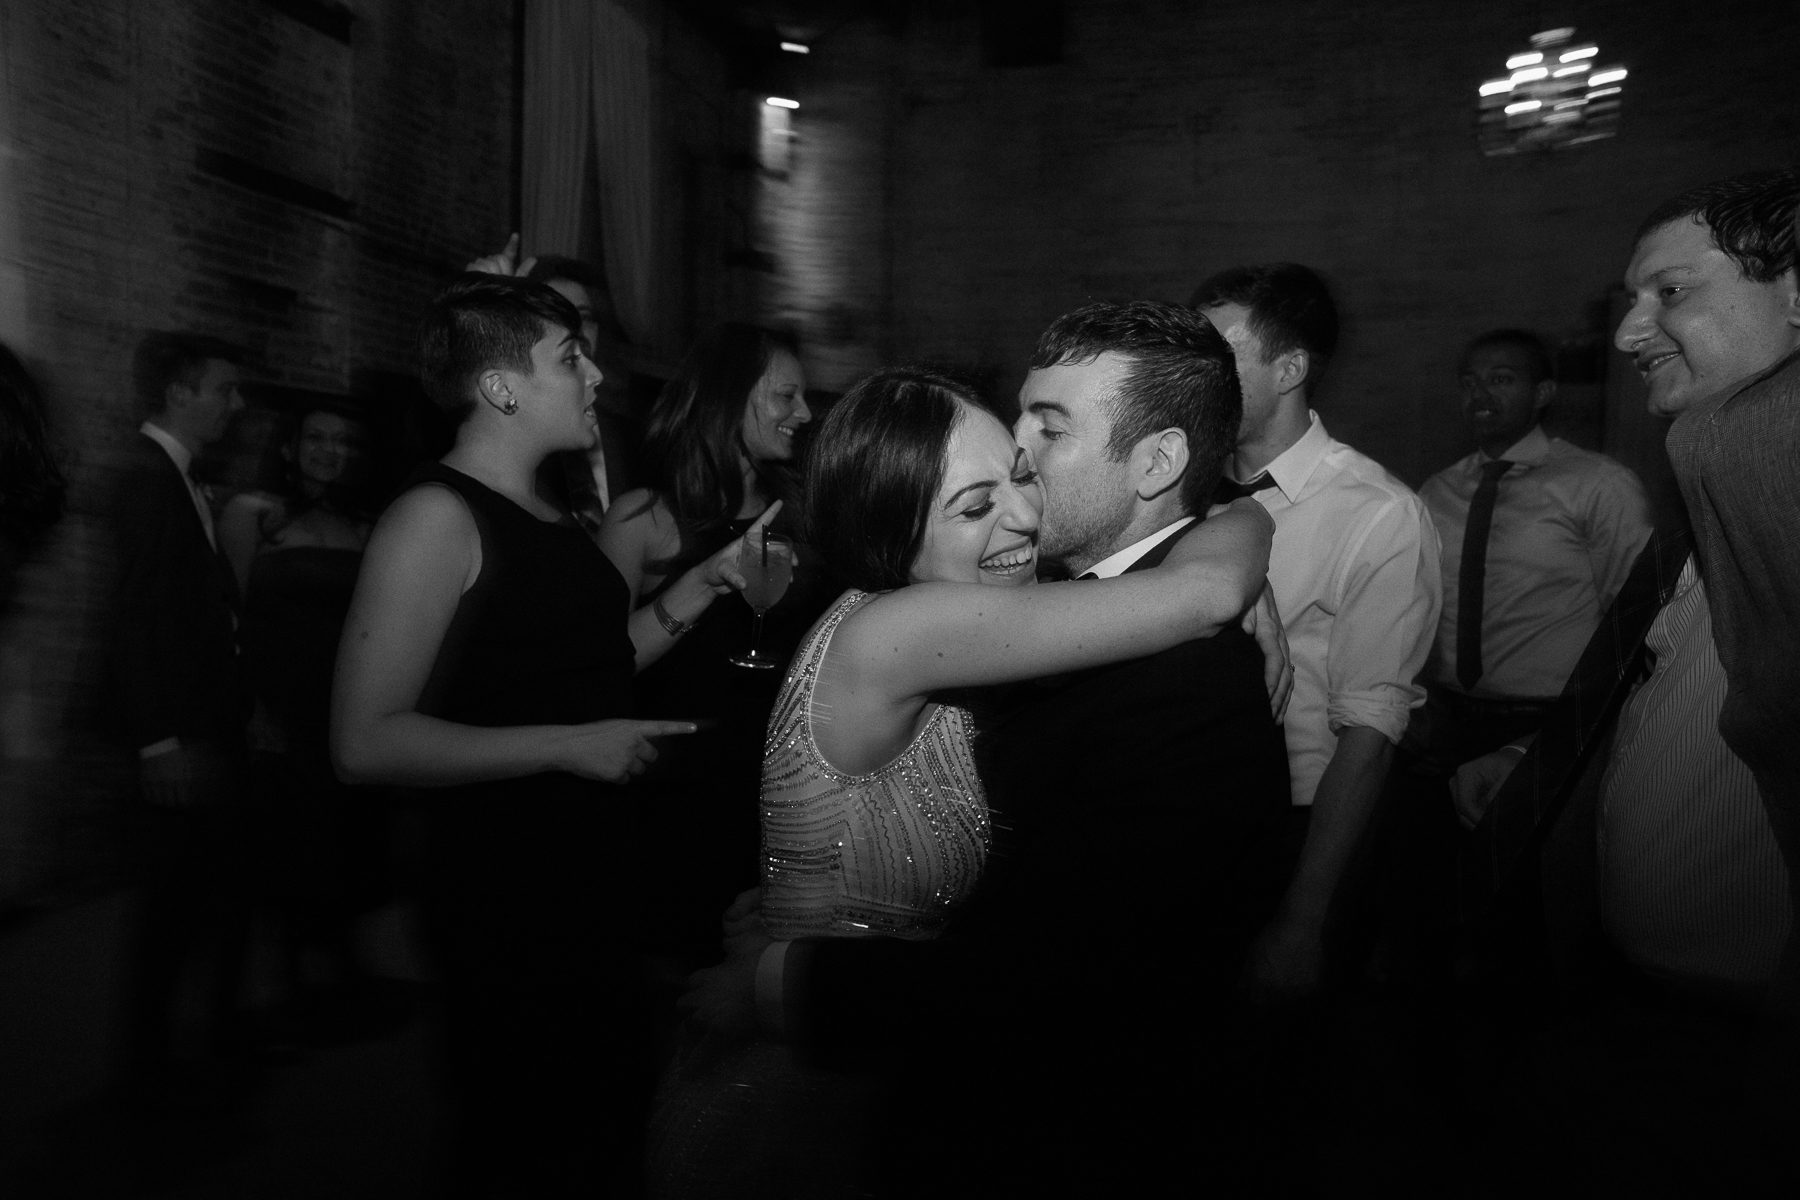 2018_NYC_Wedding_Photographer_Nontraditional_Candid-4.jpg